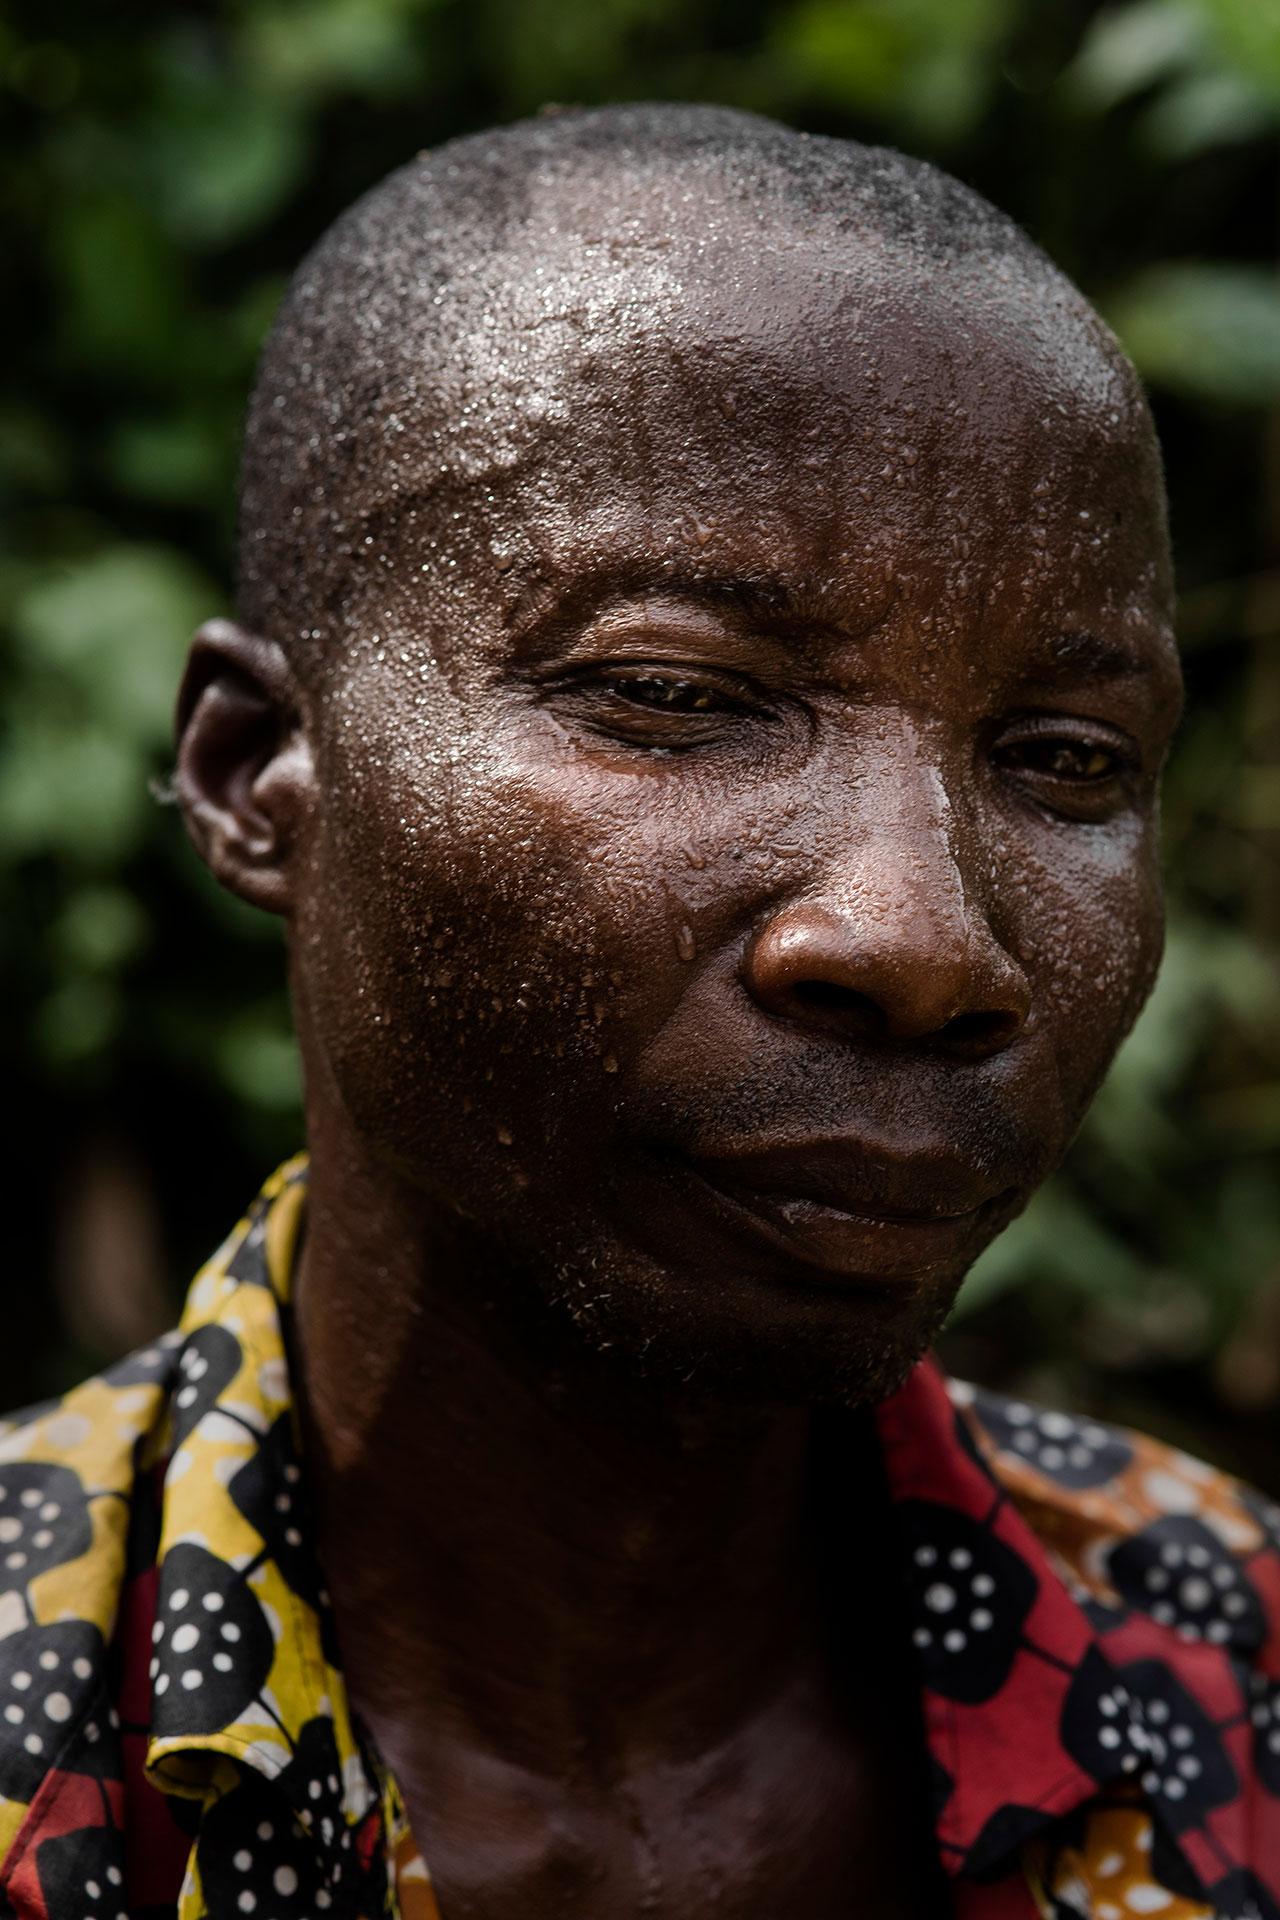 Mies Ugandassa